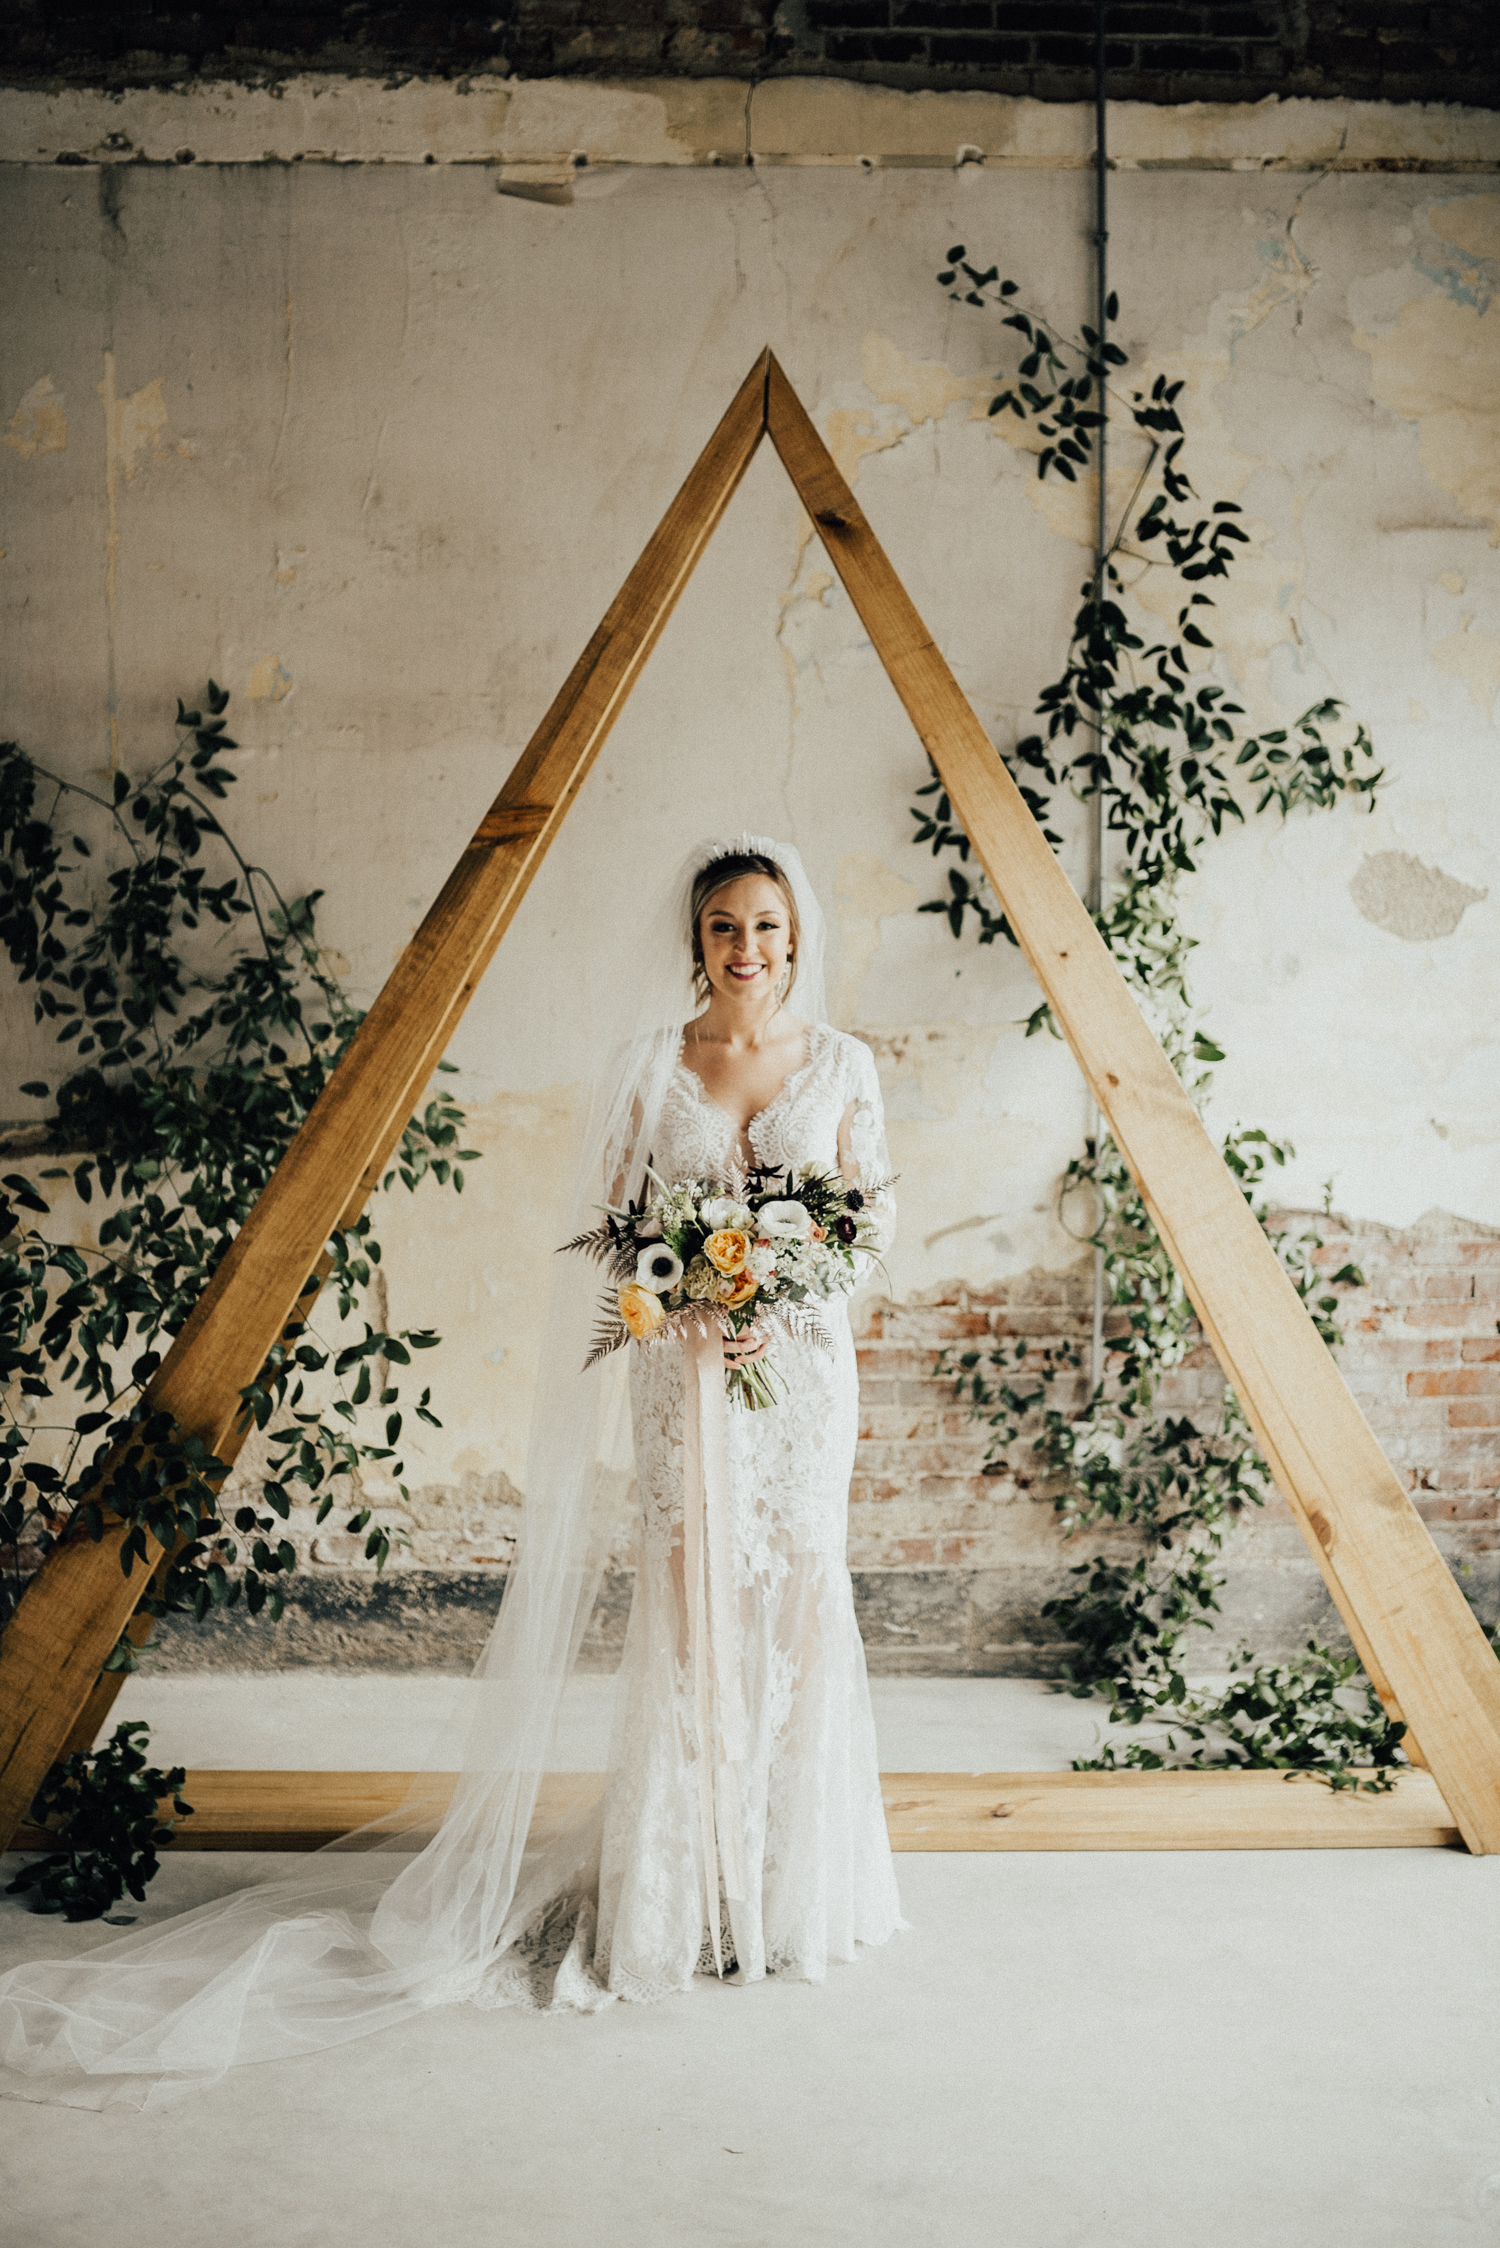 St-Louis-wedding-photographers-83.jpg